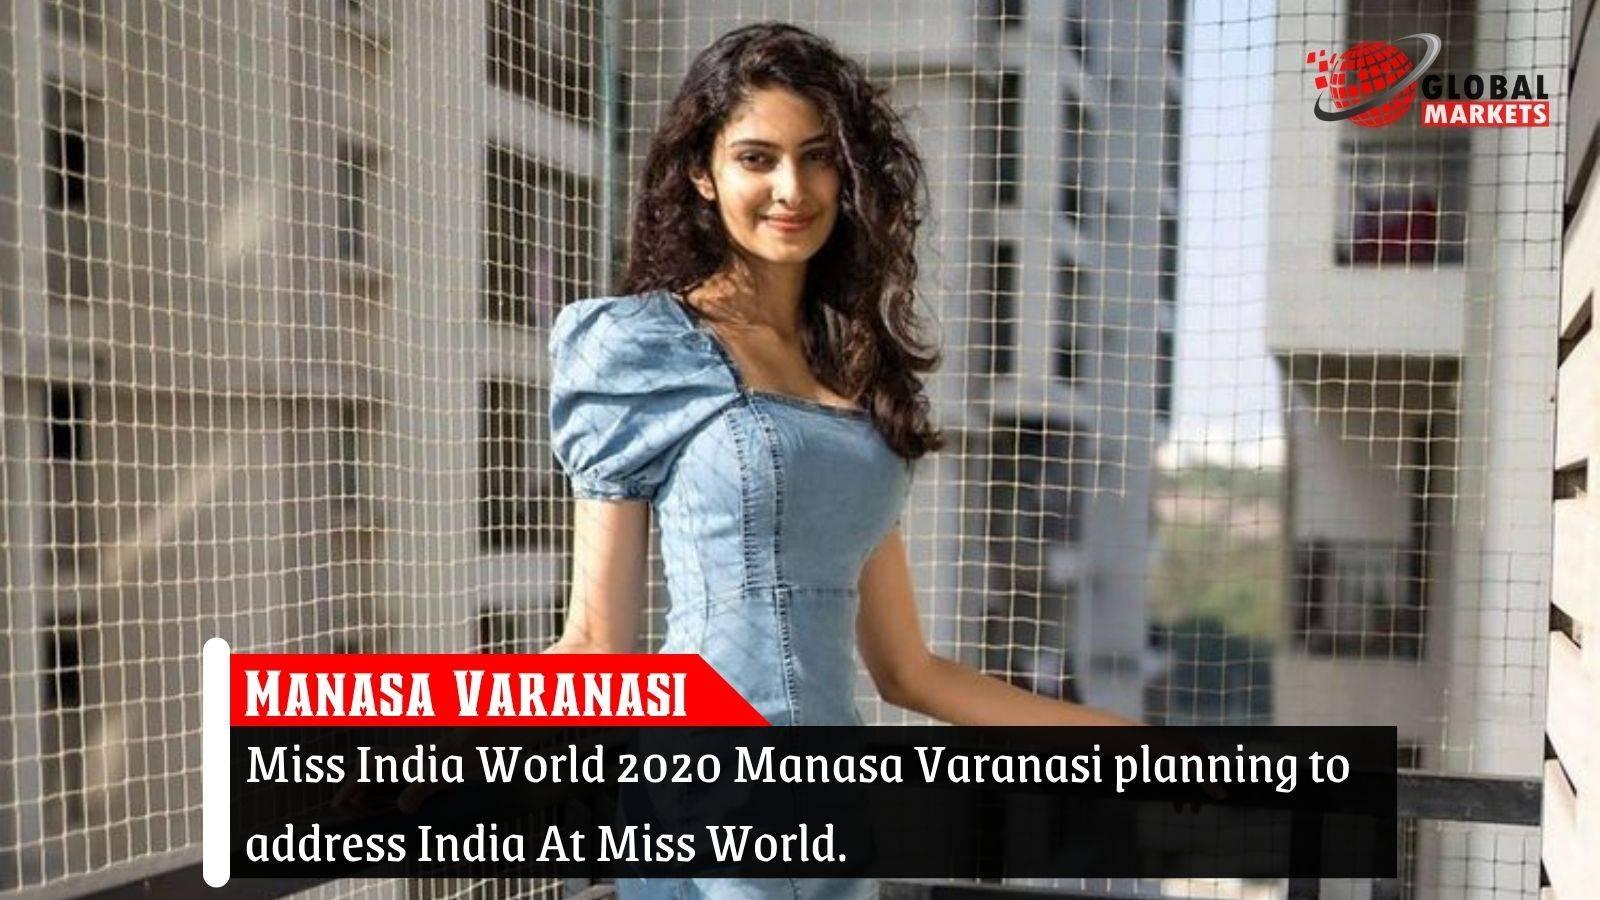 Miss India World 2020 Manasa Varanasi planning for Miss World.